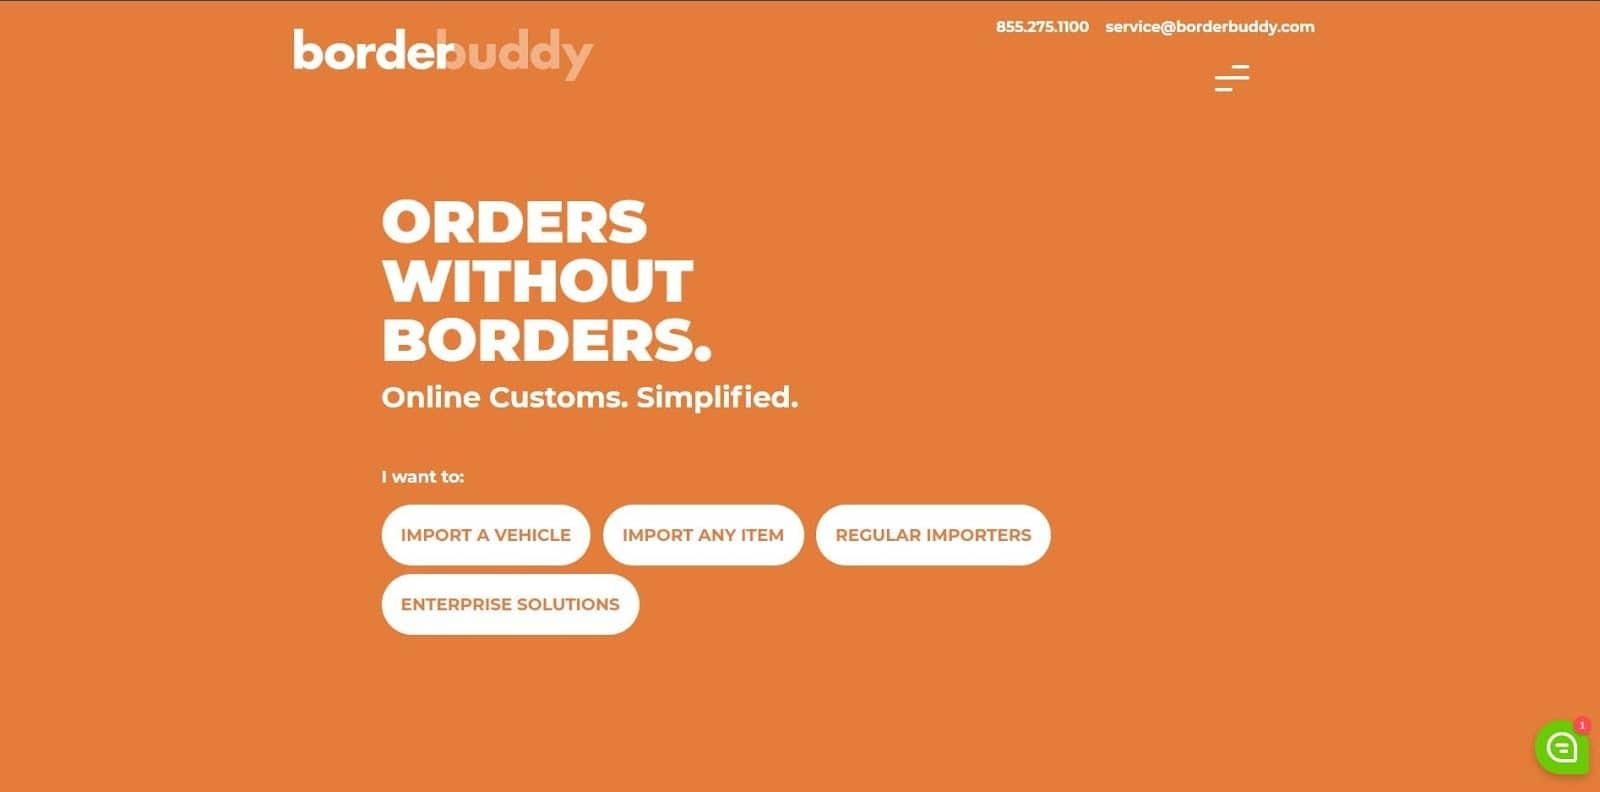 Borderbuddy landing page